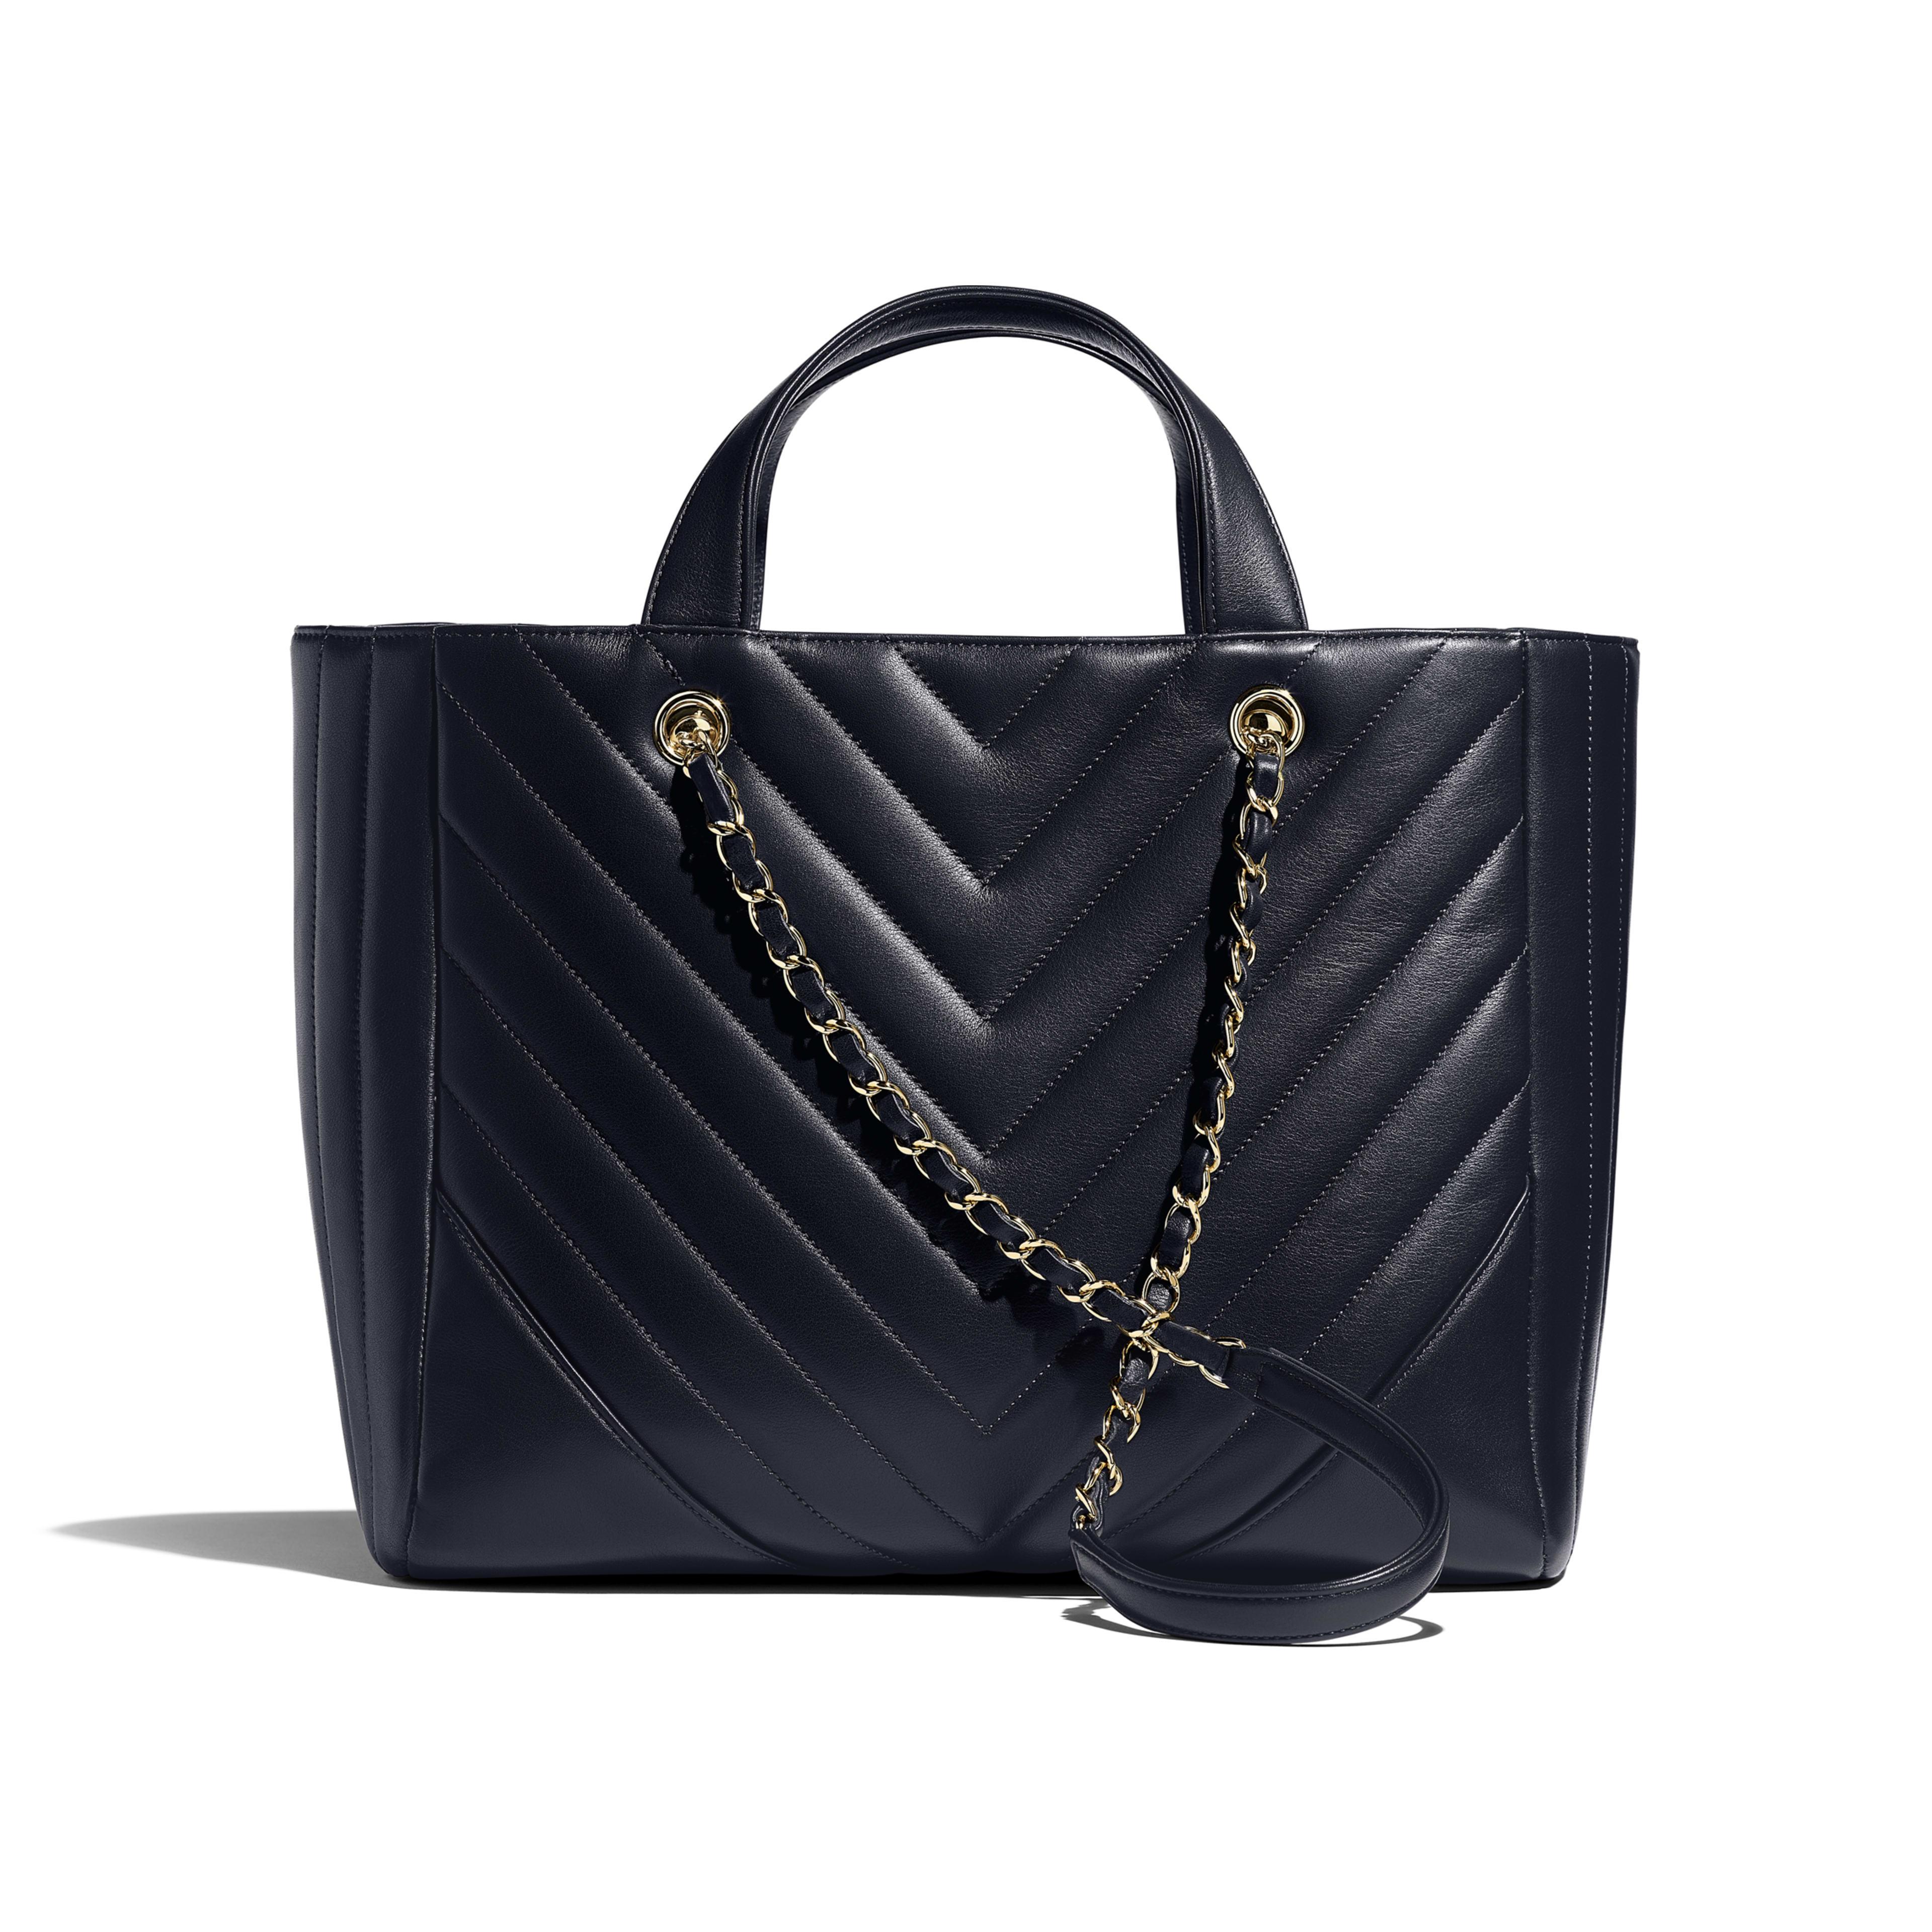 Large Shopping Bag - Navy Blue - Calfskin & Gold-Tone Metal - Alternative view - see full sized version